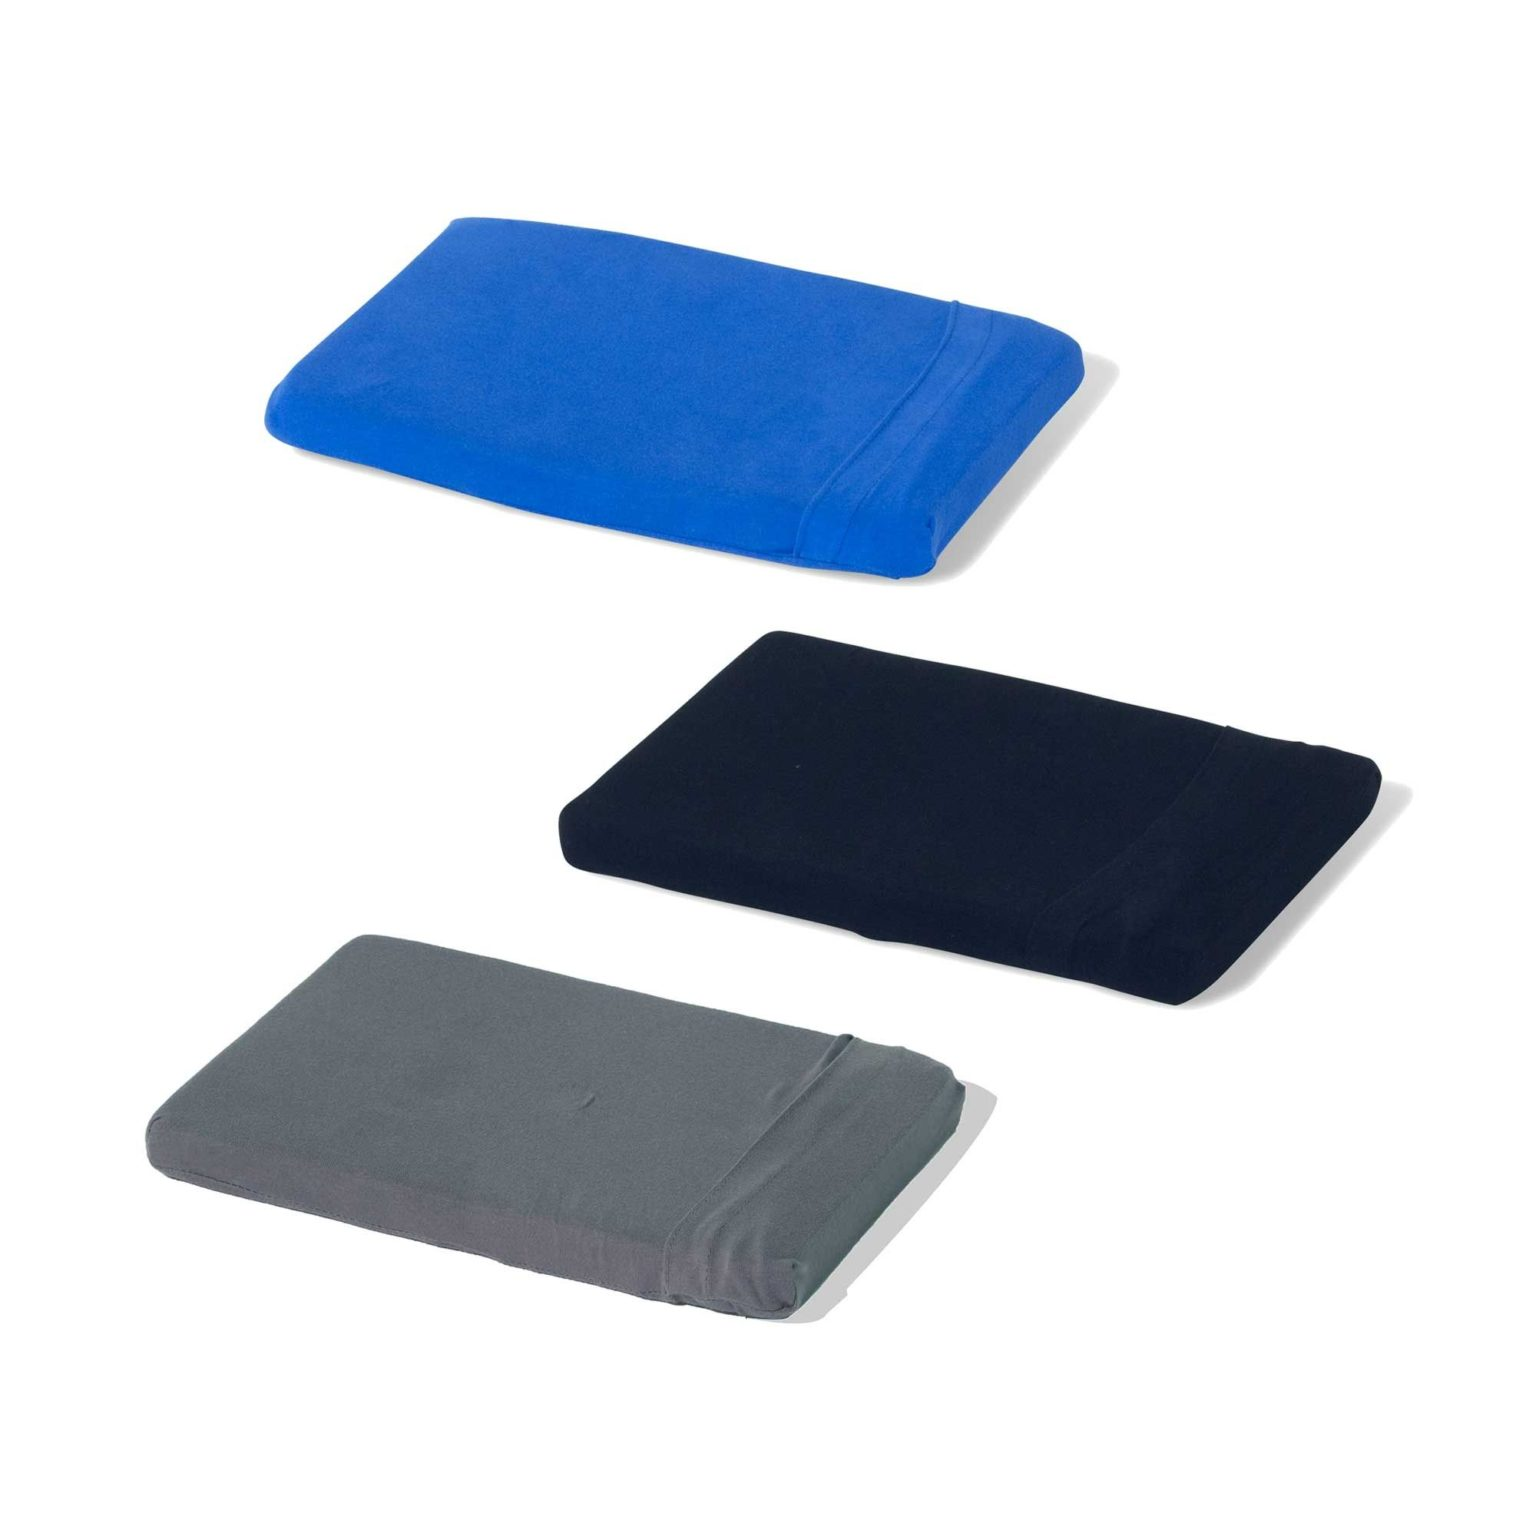 3 Pilates head pads